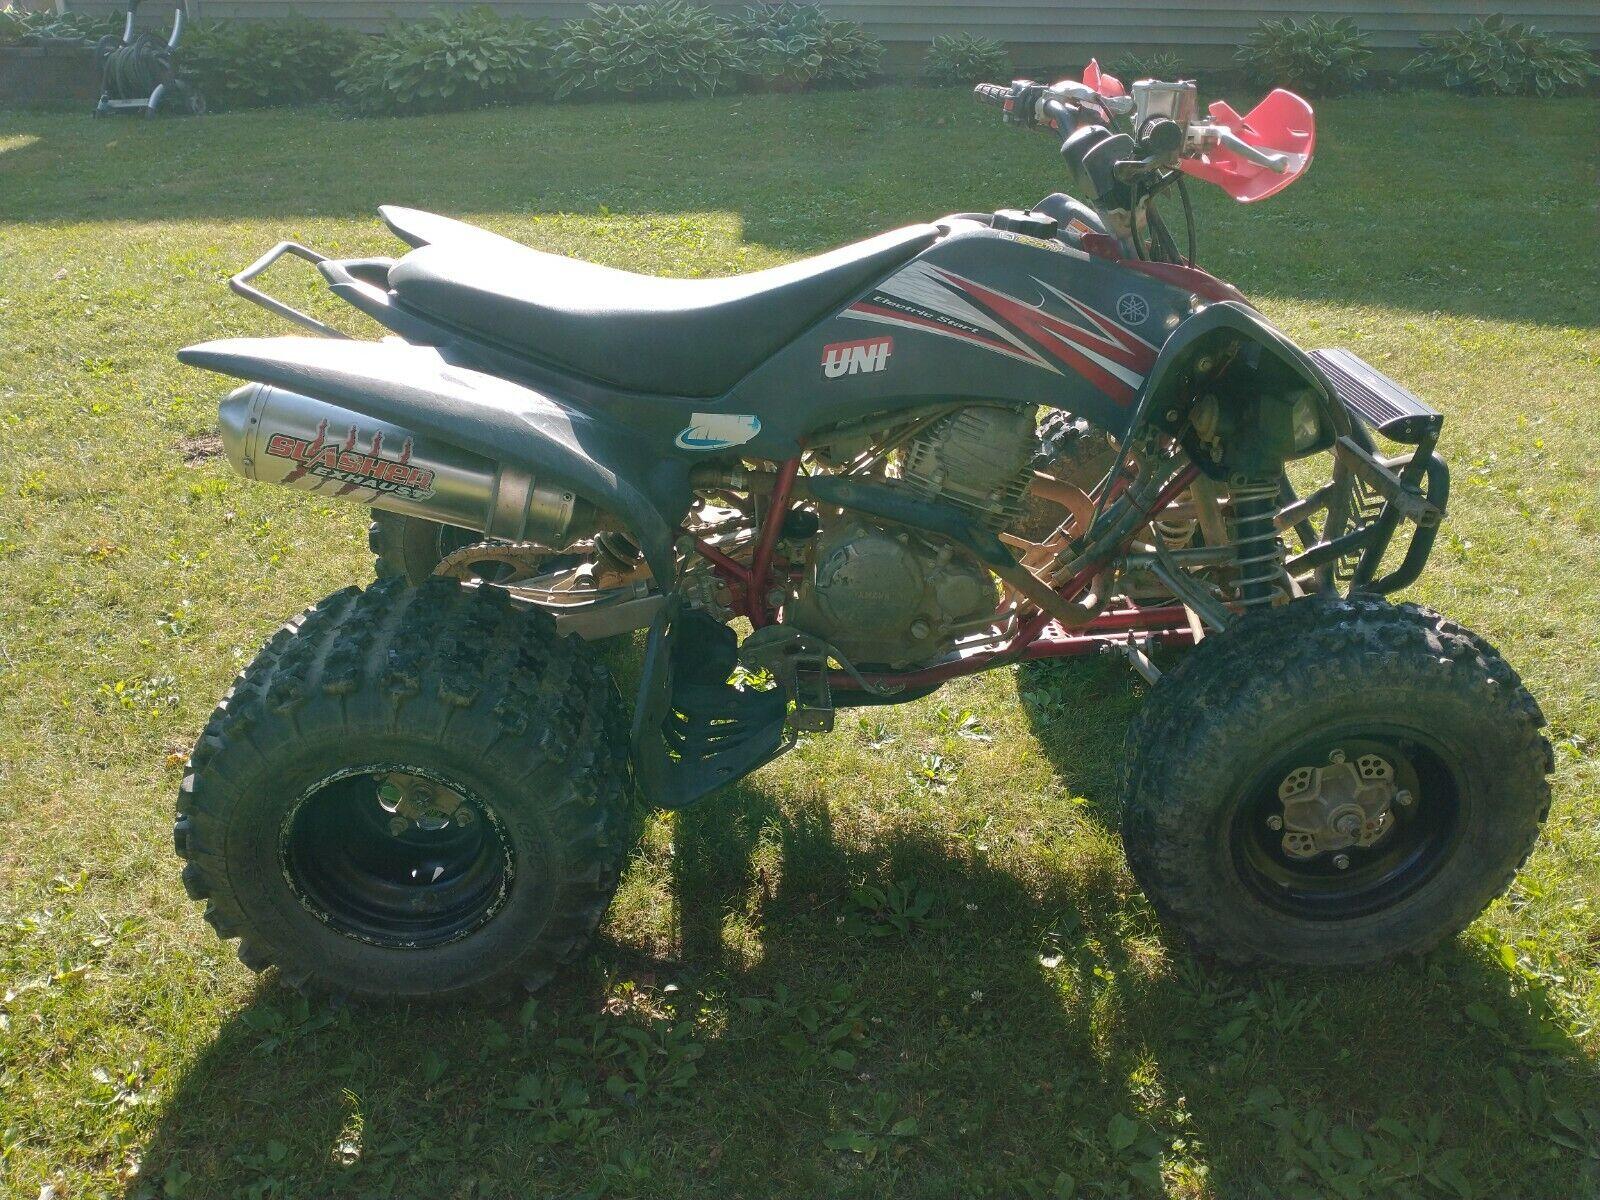 2008 Yamaha Raptor 250 Used